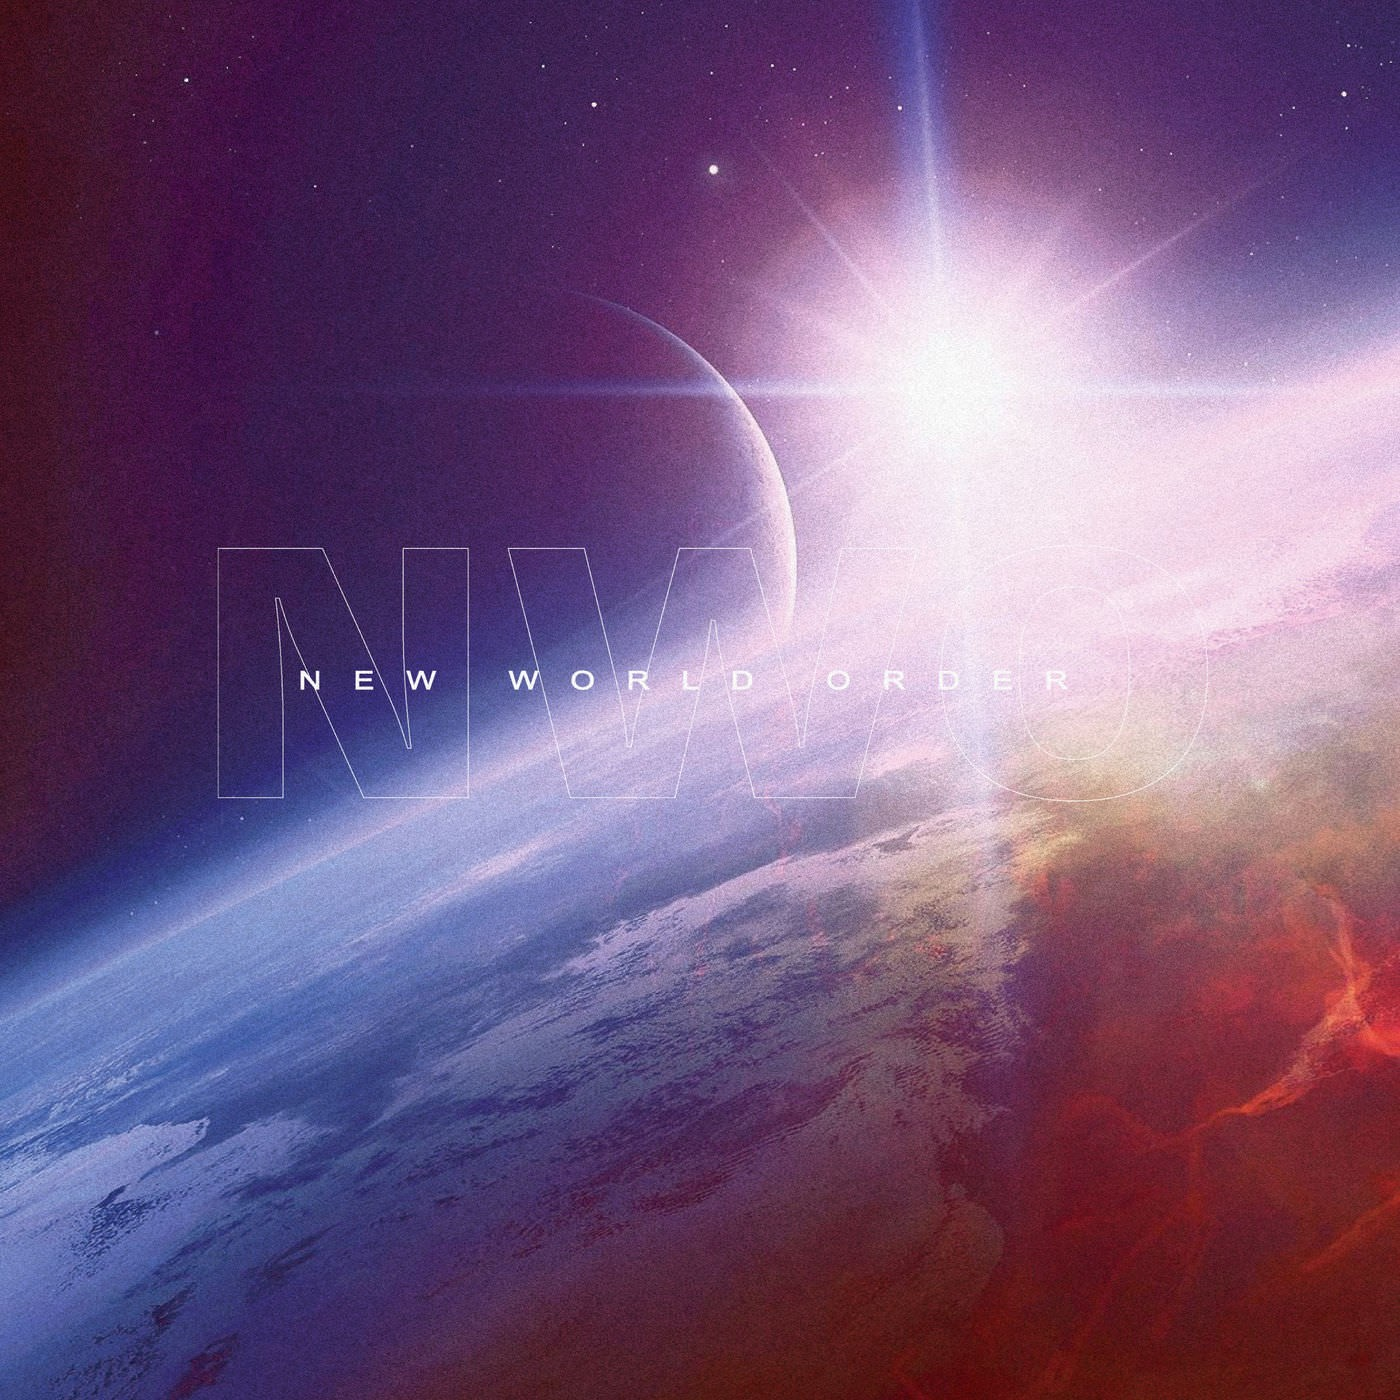 Lunv Loyal – New World Order [FLAC / WEB] [2018.12.05]